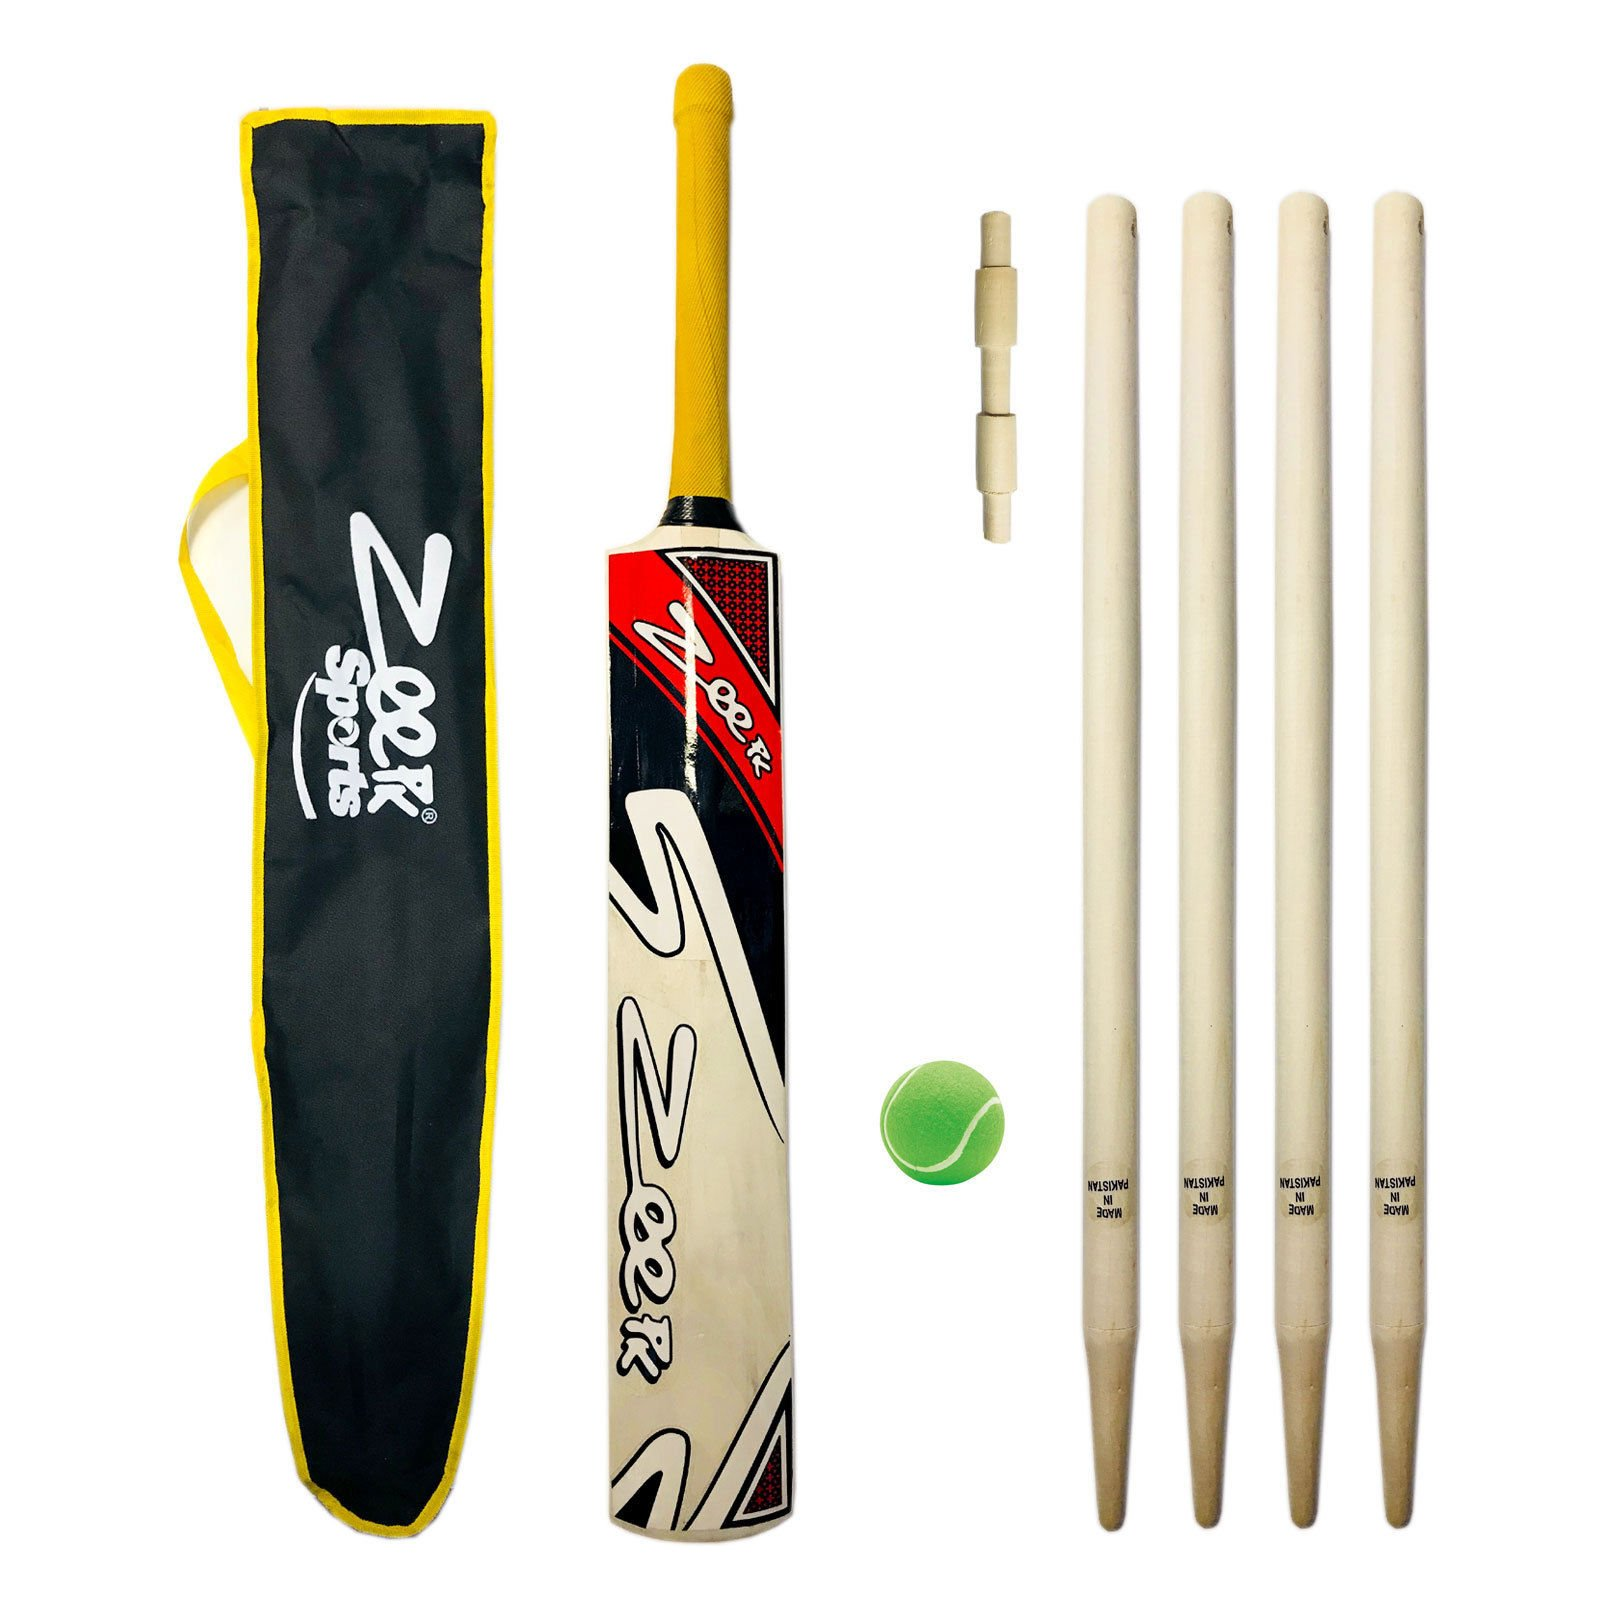 Zeepk Sports Complete Junior Cricket BAT KIT for Kids Age 8-14 Years Kashmir Willow BAT + WICKETS